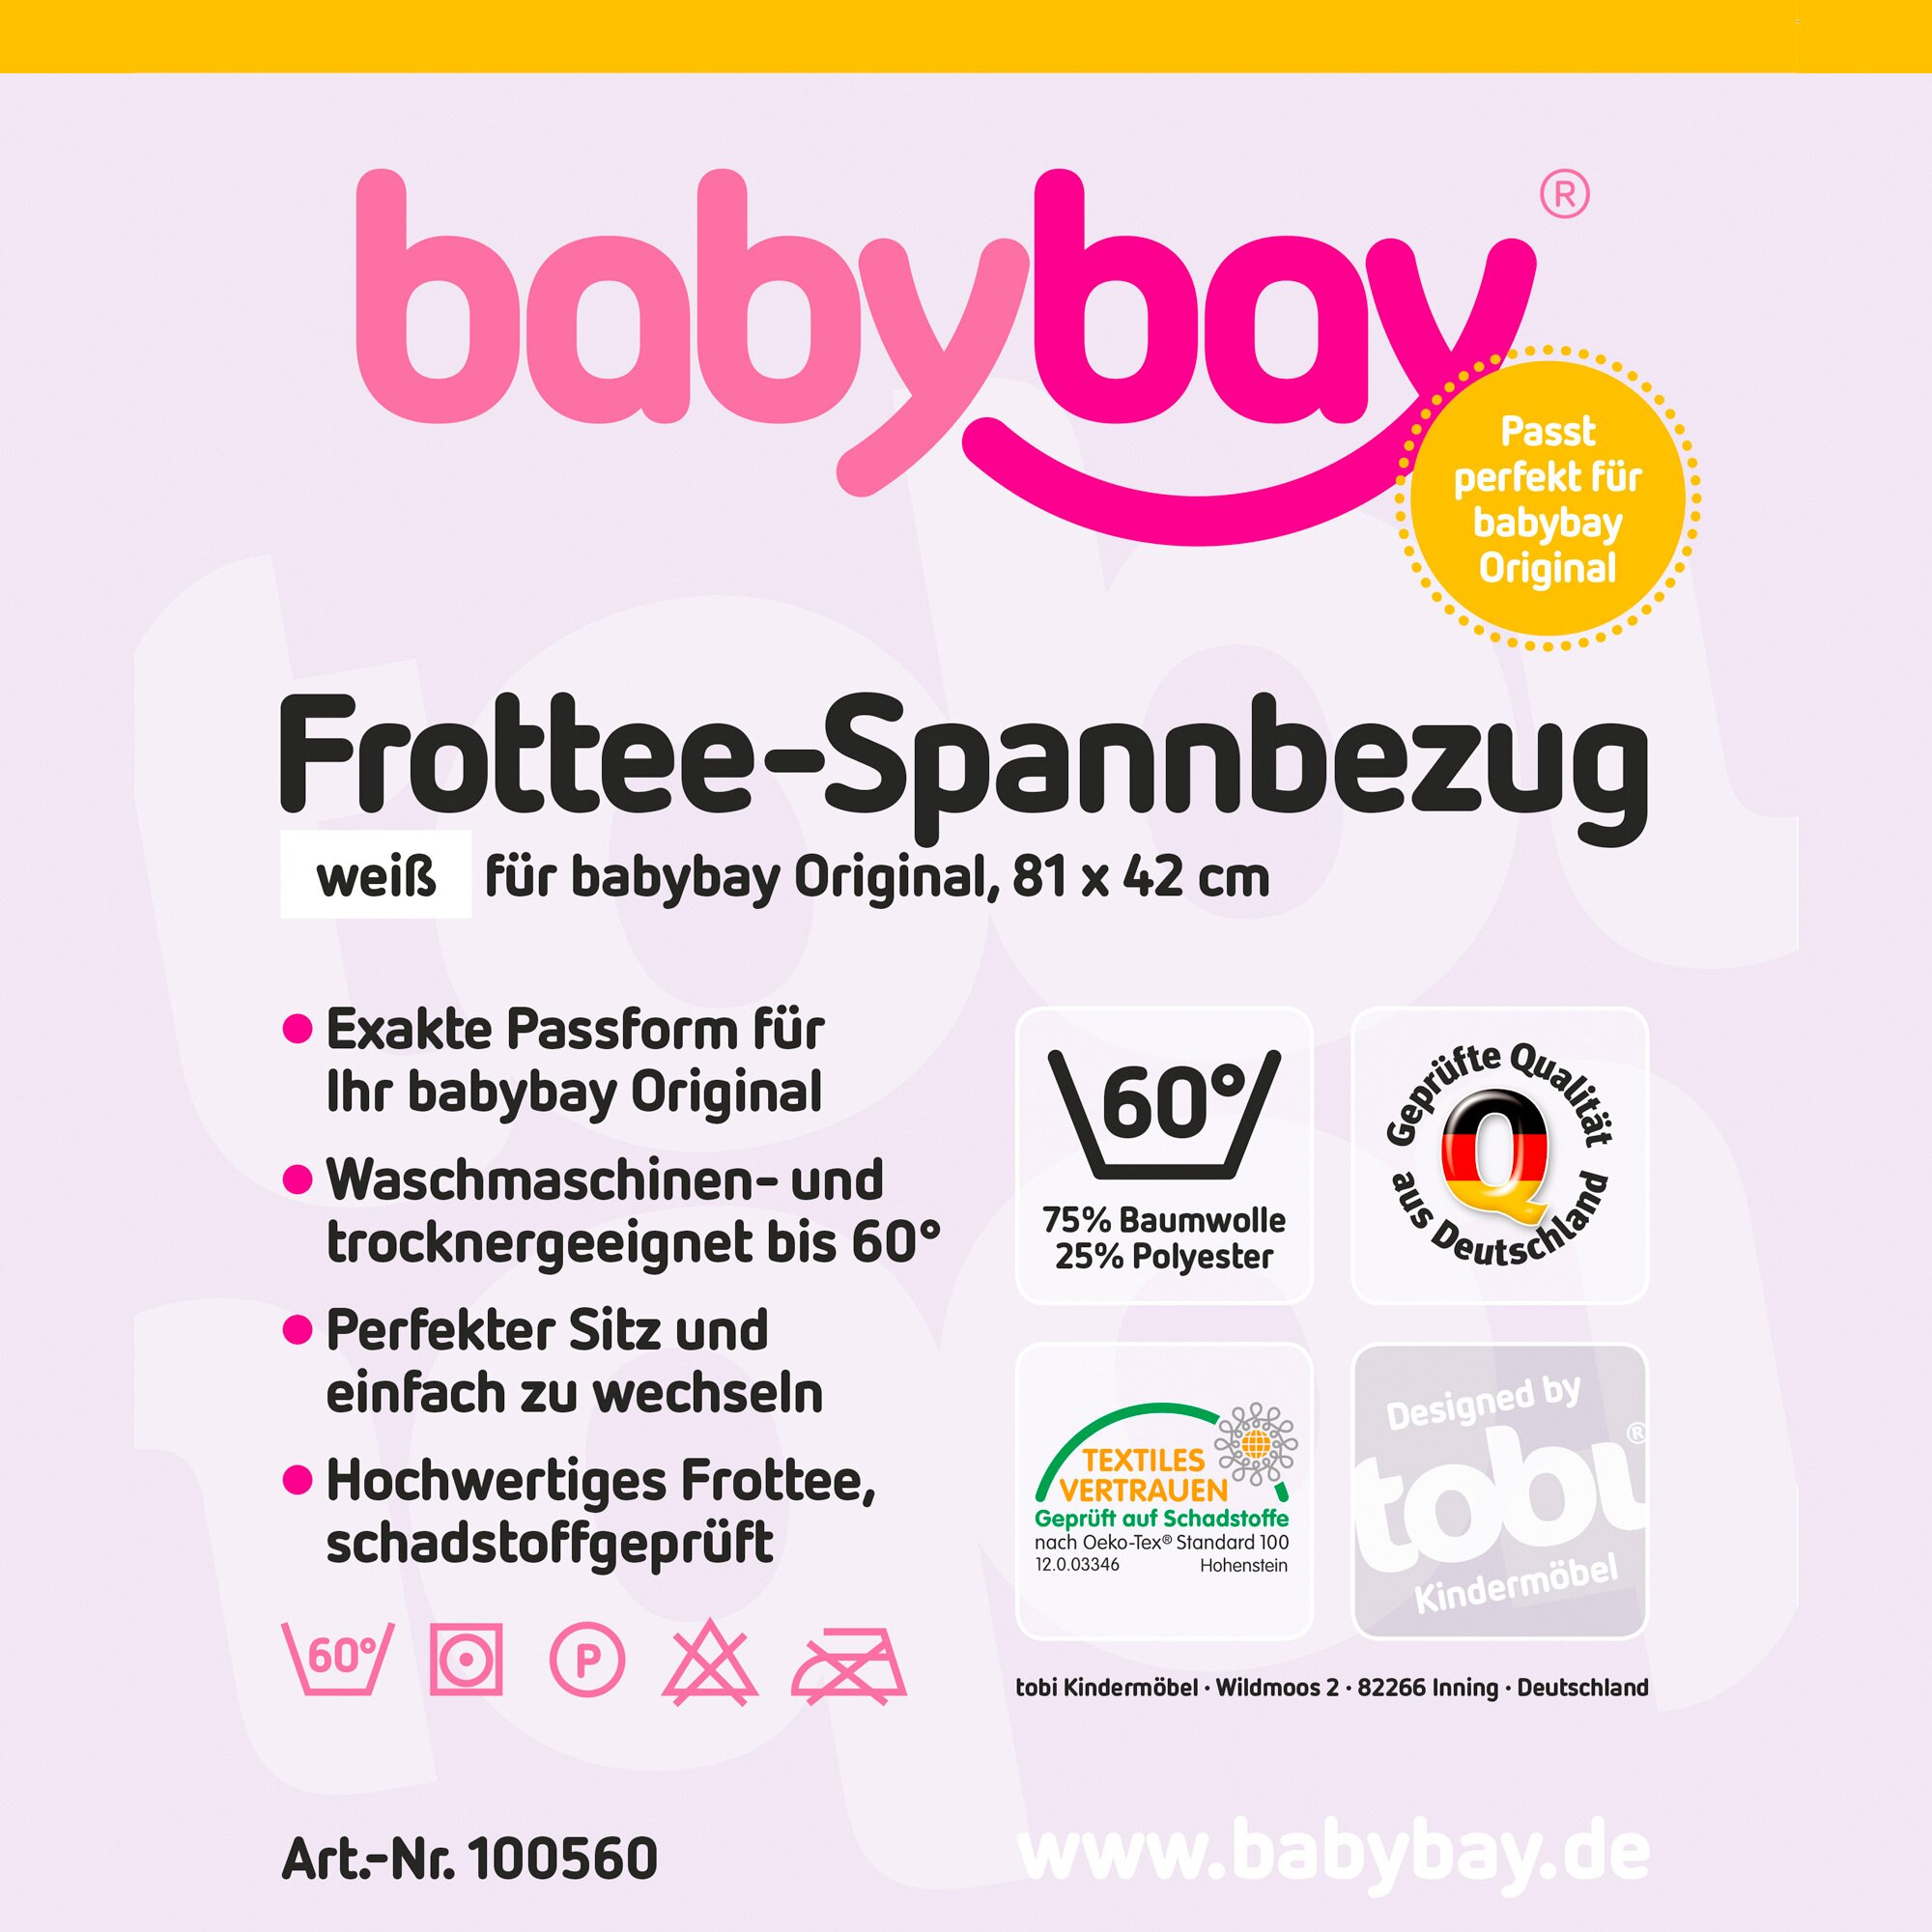 Babybay® Frottee-Spannbetttuch Original 81x43 cm weiss